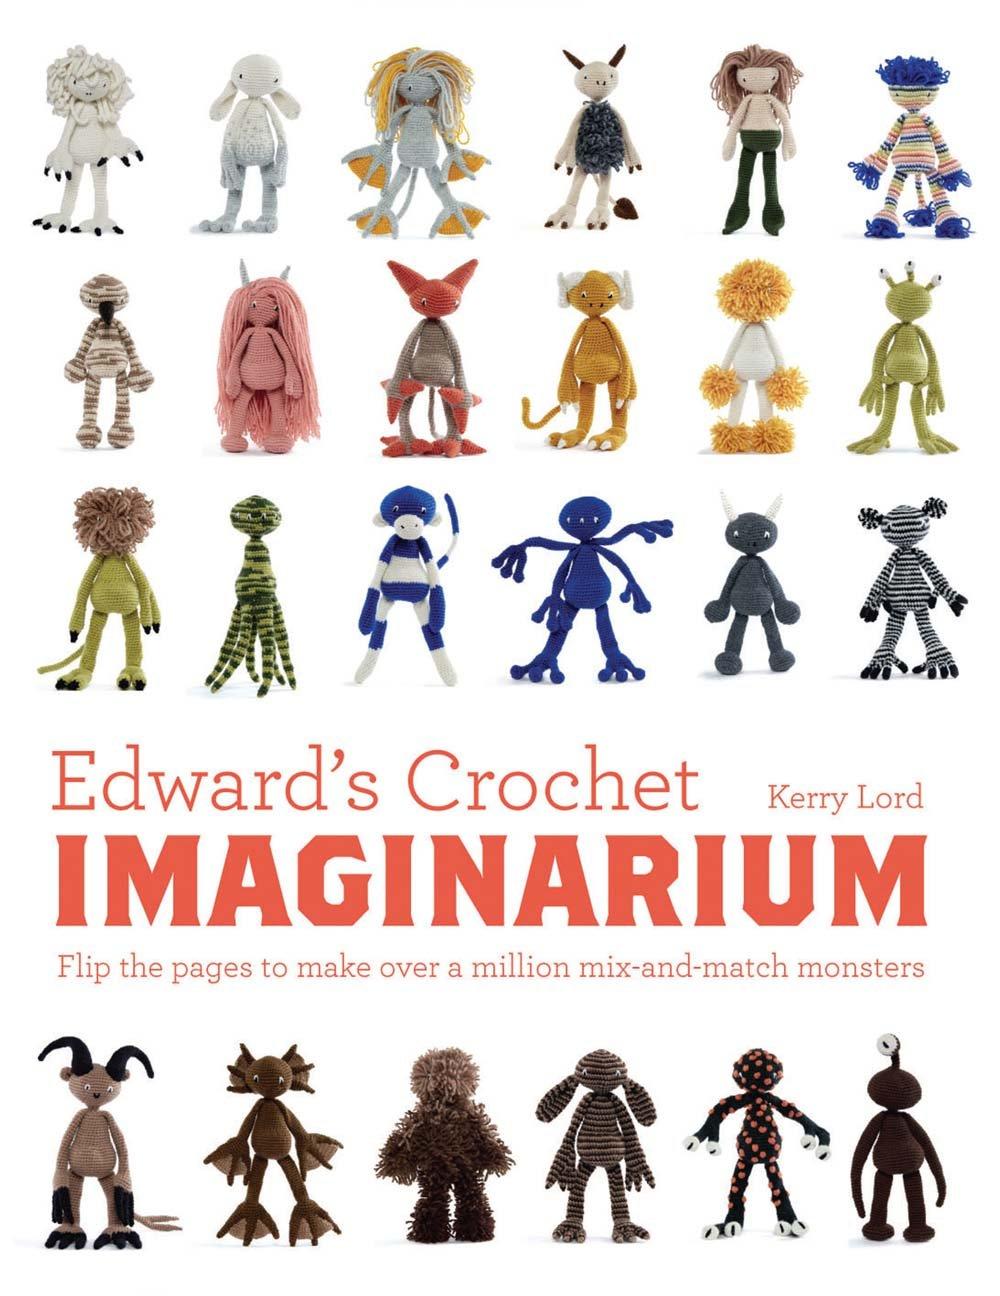 Edwards Crochet Imaginarium Mix Match product image